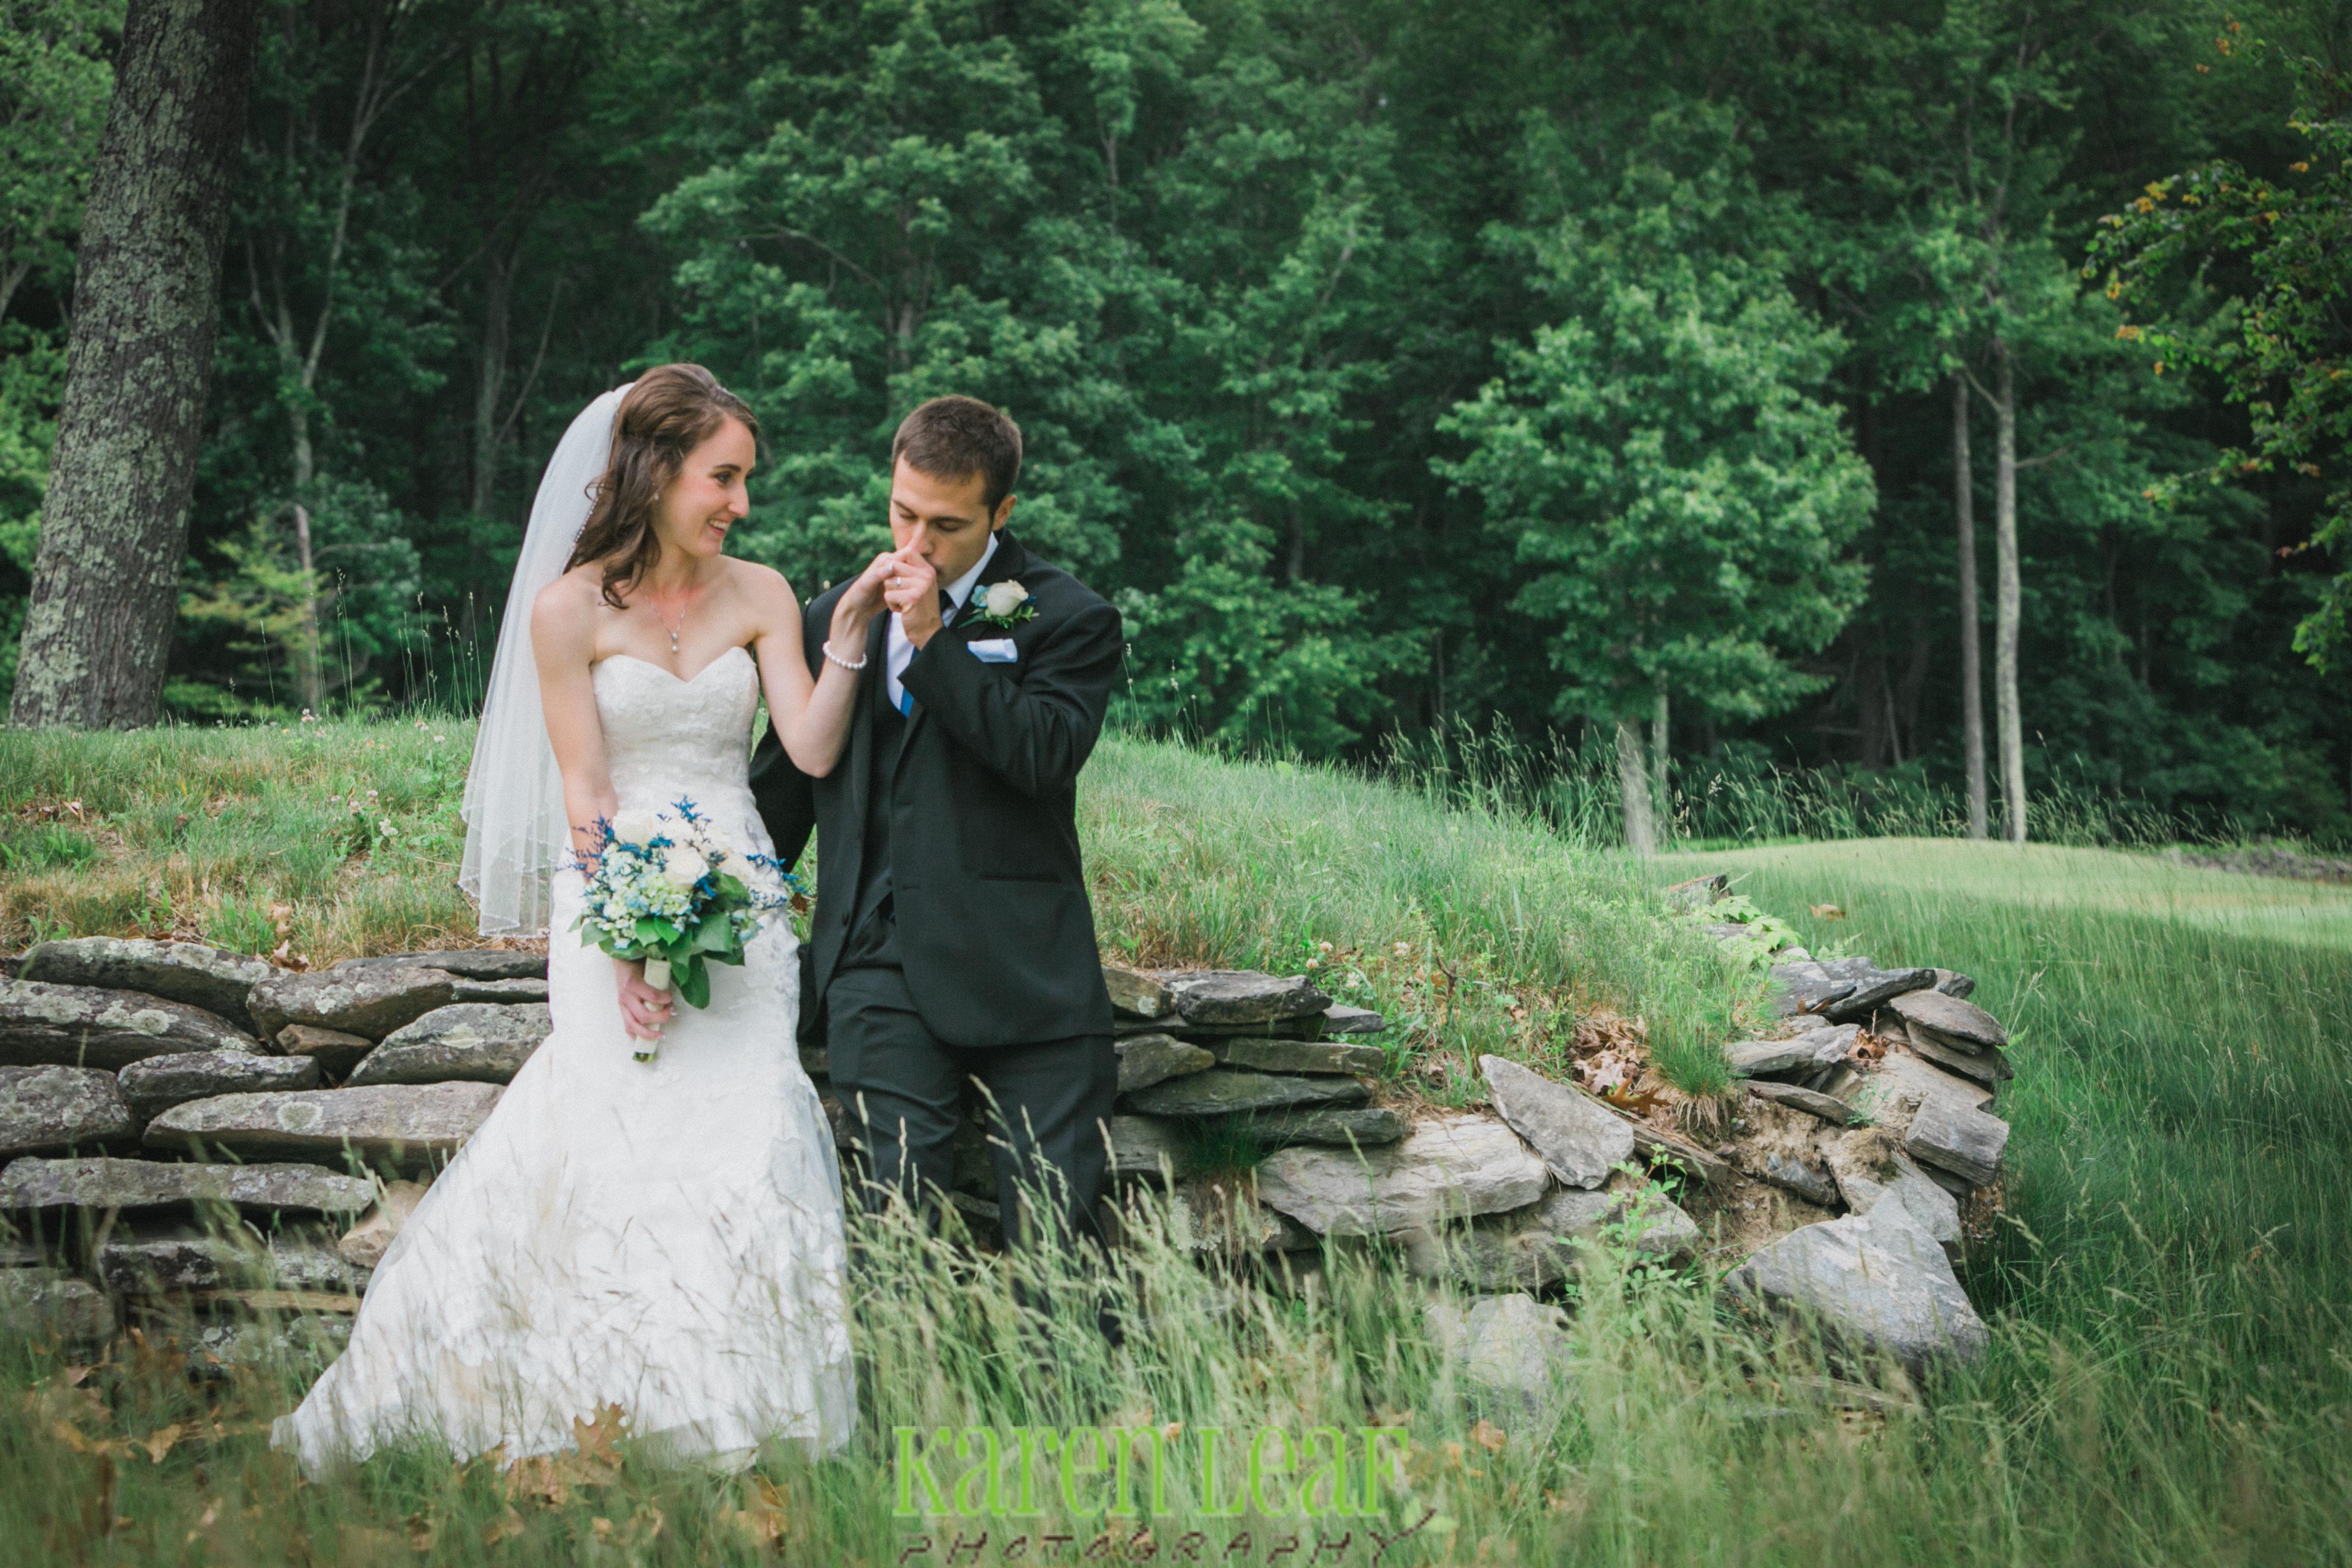 Romantic walk around after wedding